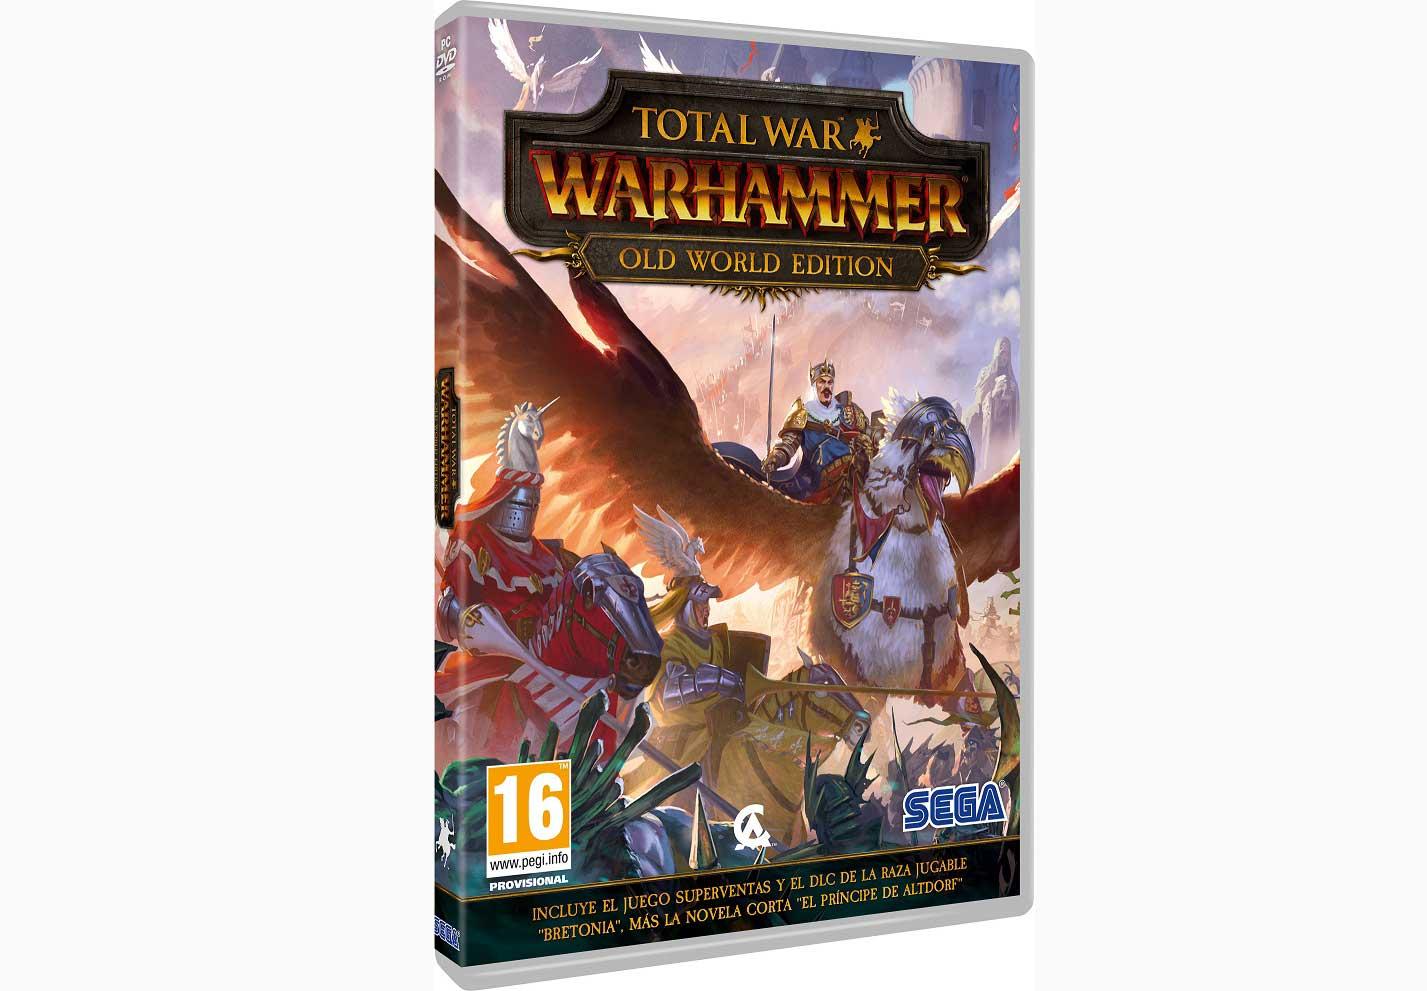 Old World Edition de Total War Warhammer